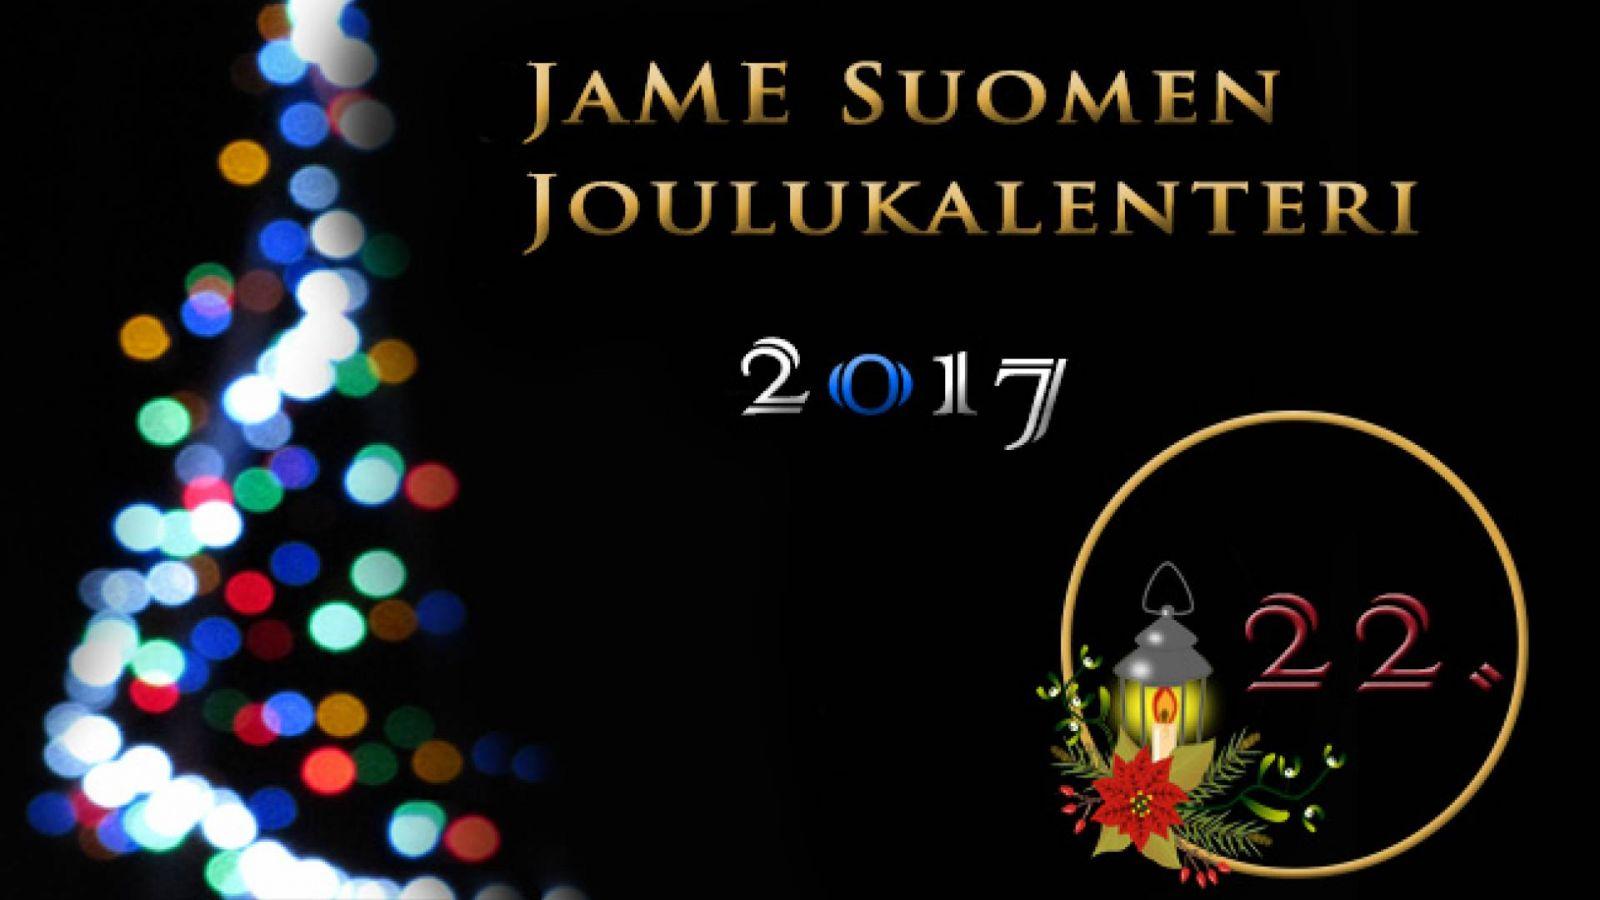 JaME Suomen joulukalenterin 22. luukku © Nipsu